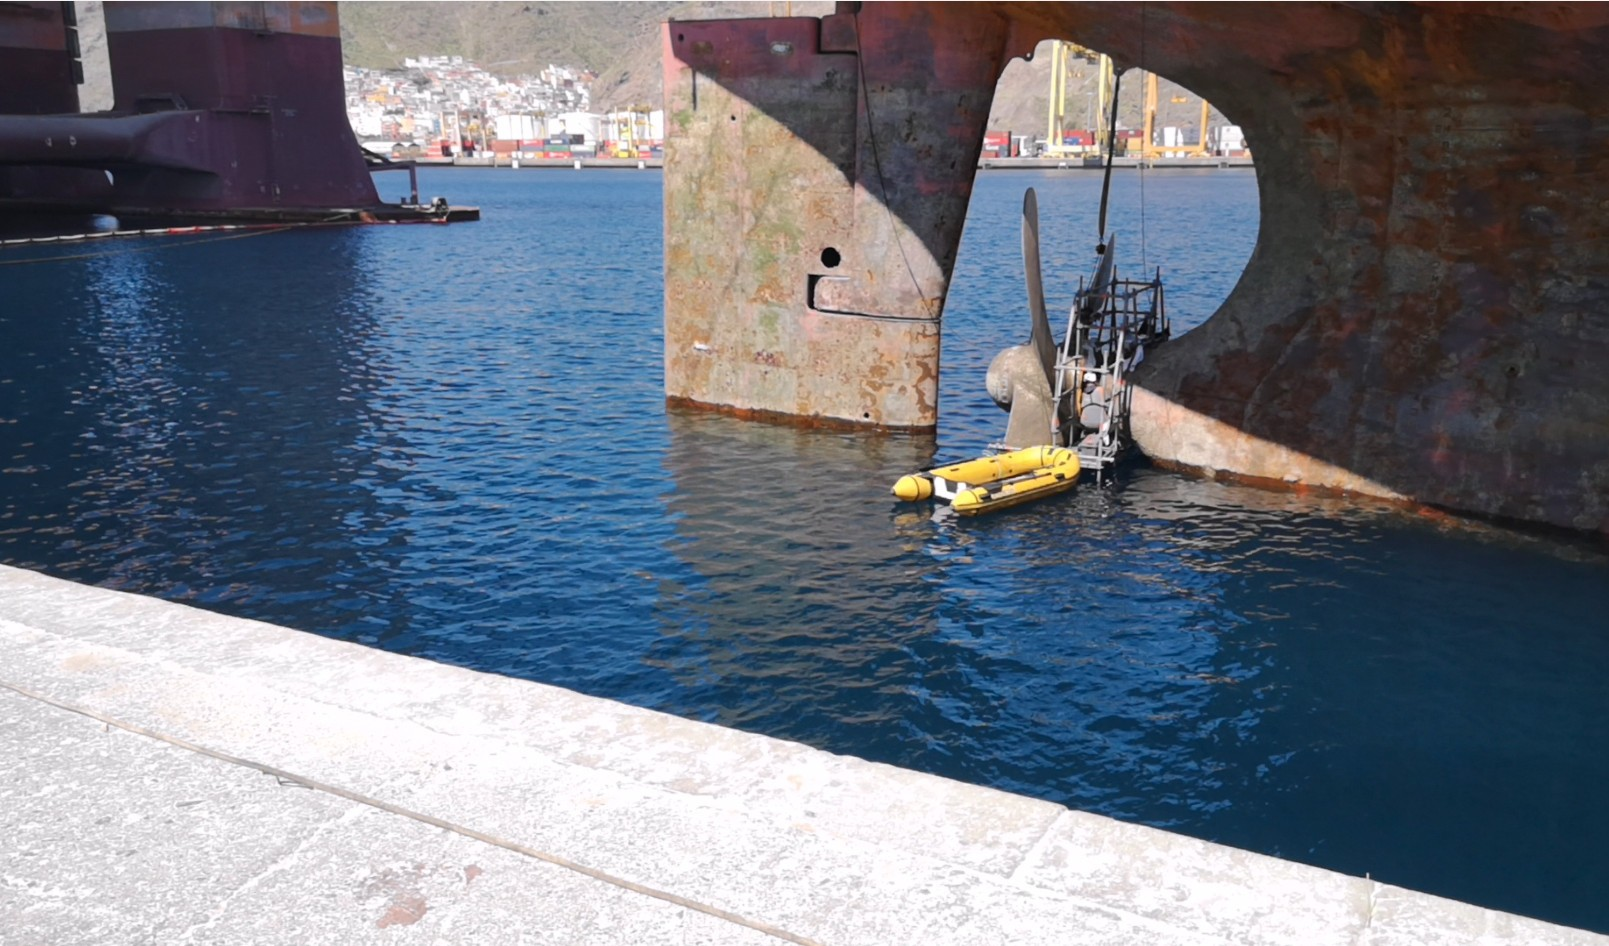 hidramar-group-ploutus-OEM-working-on-tail-shaft-seal